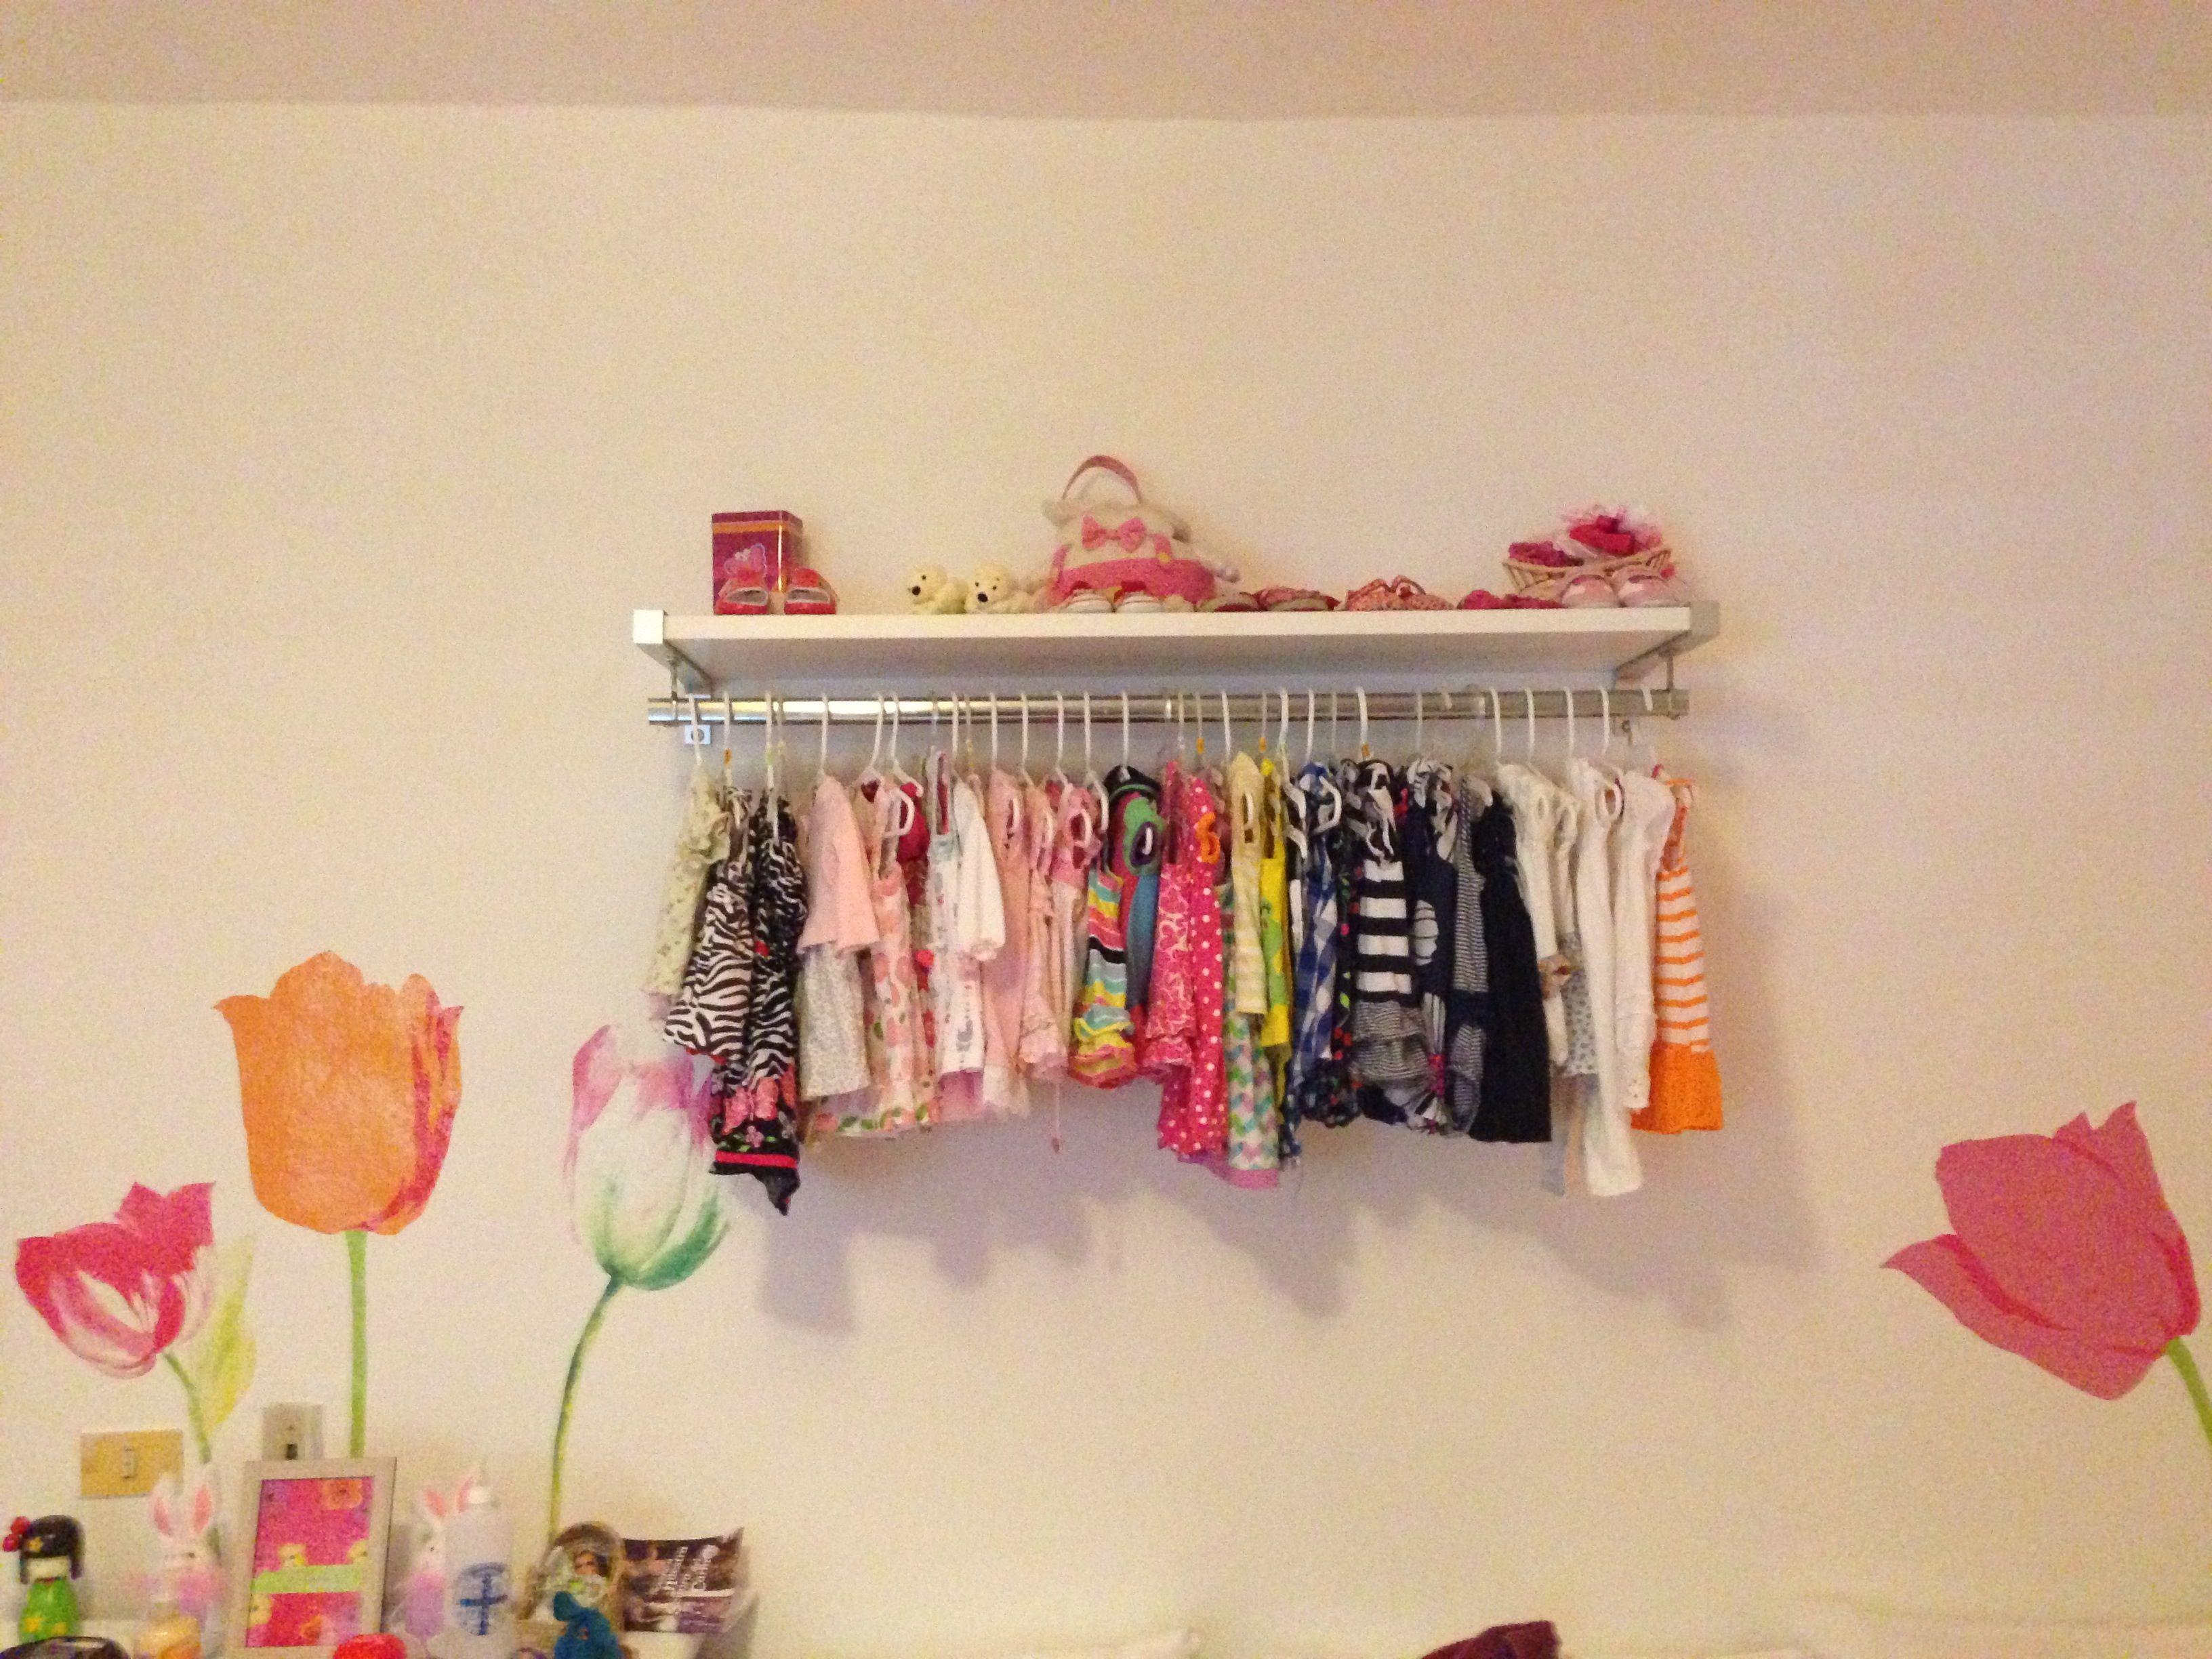 Soluci n para espacios peque os en cuartos de bebe - Cuartos para bebes ...